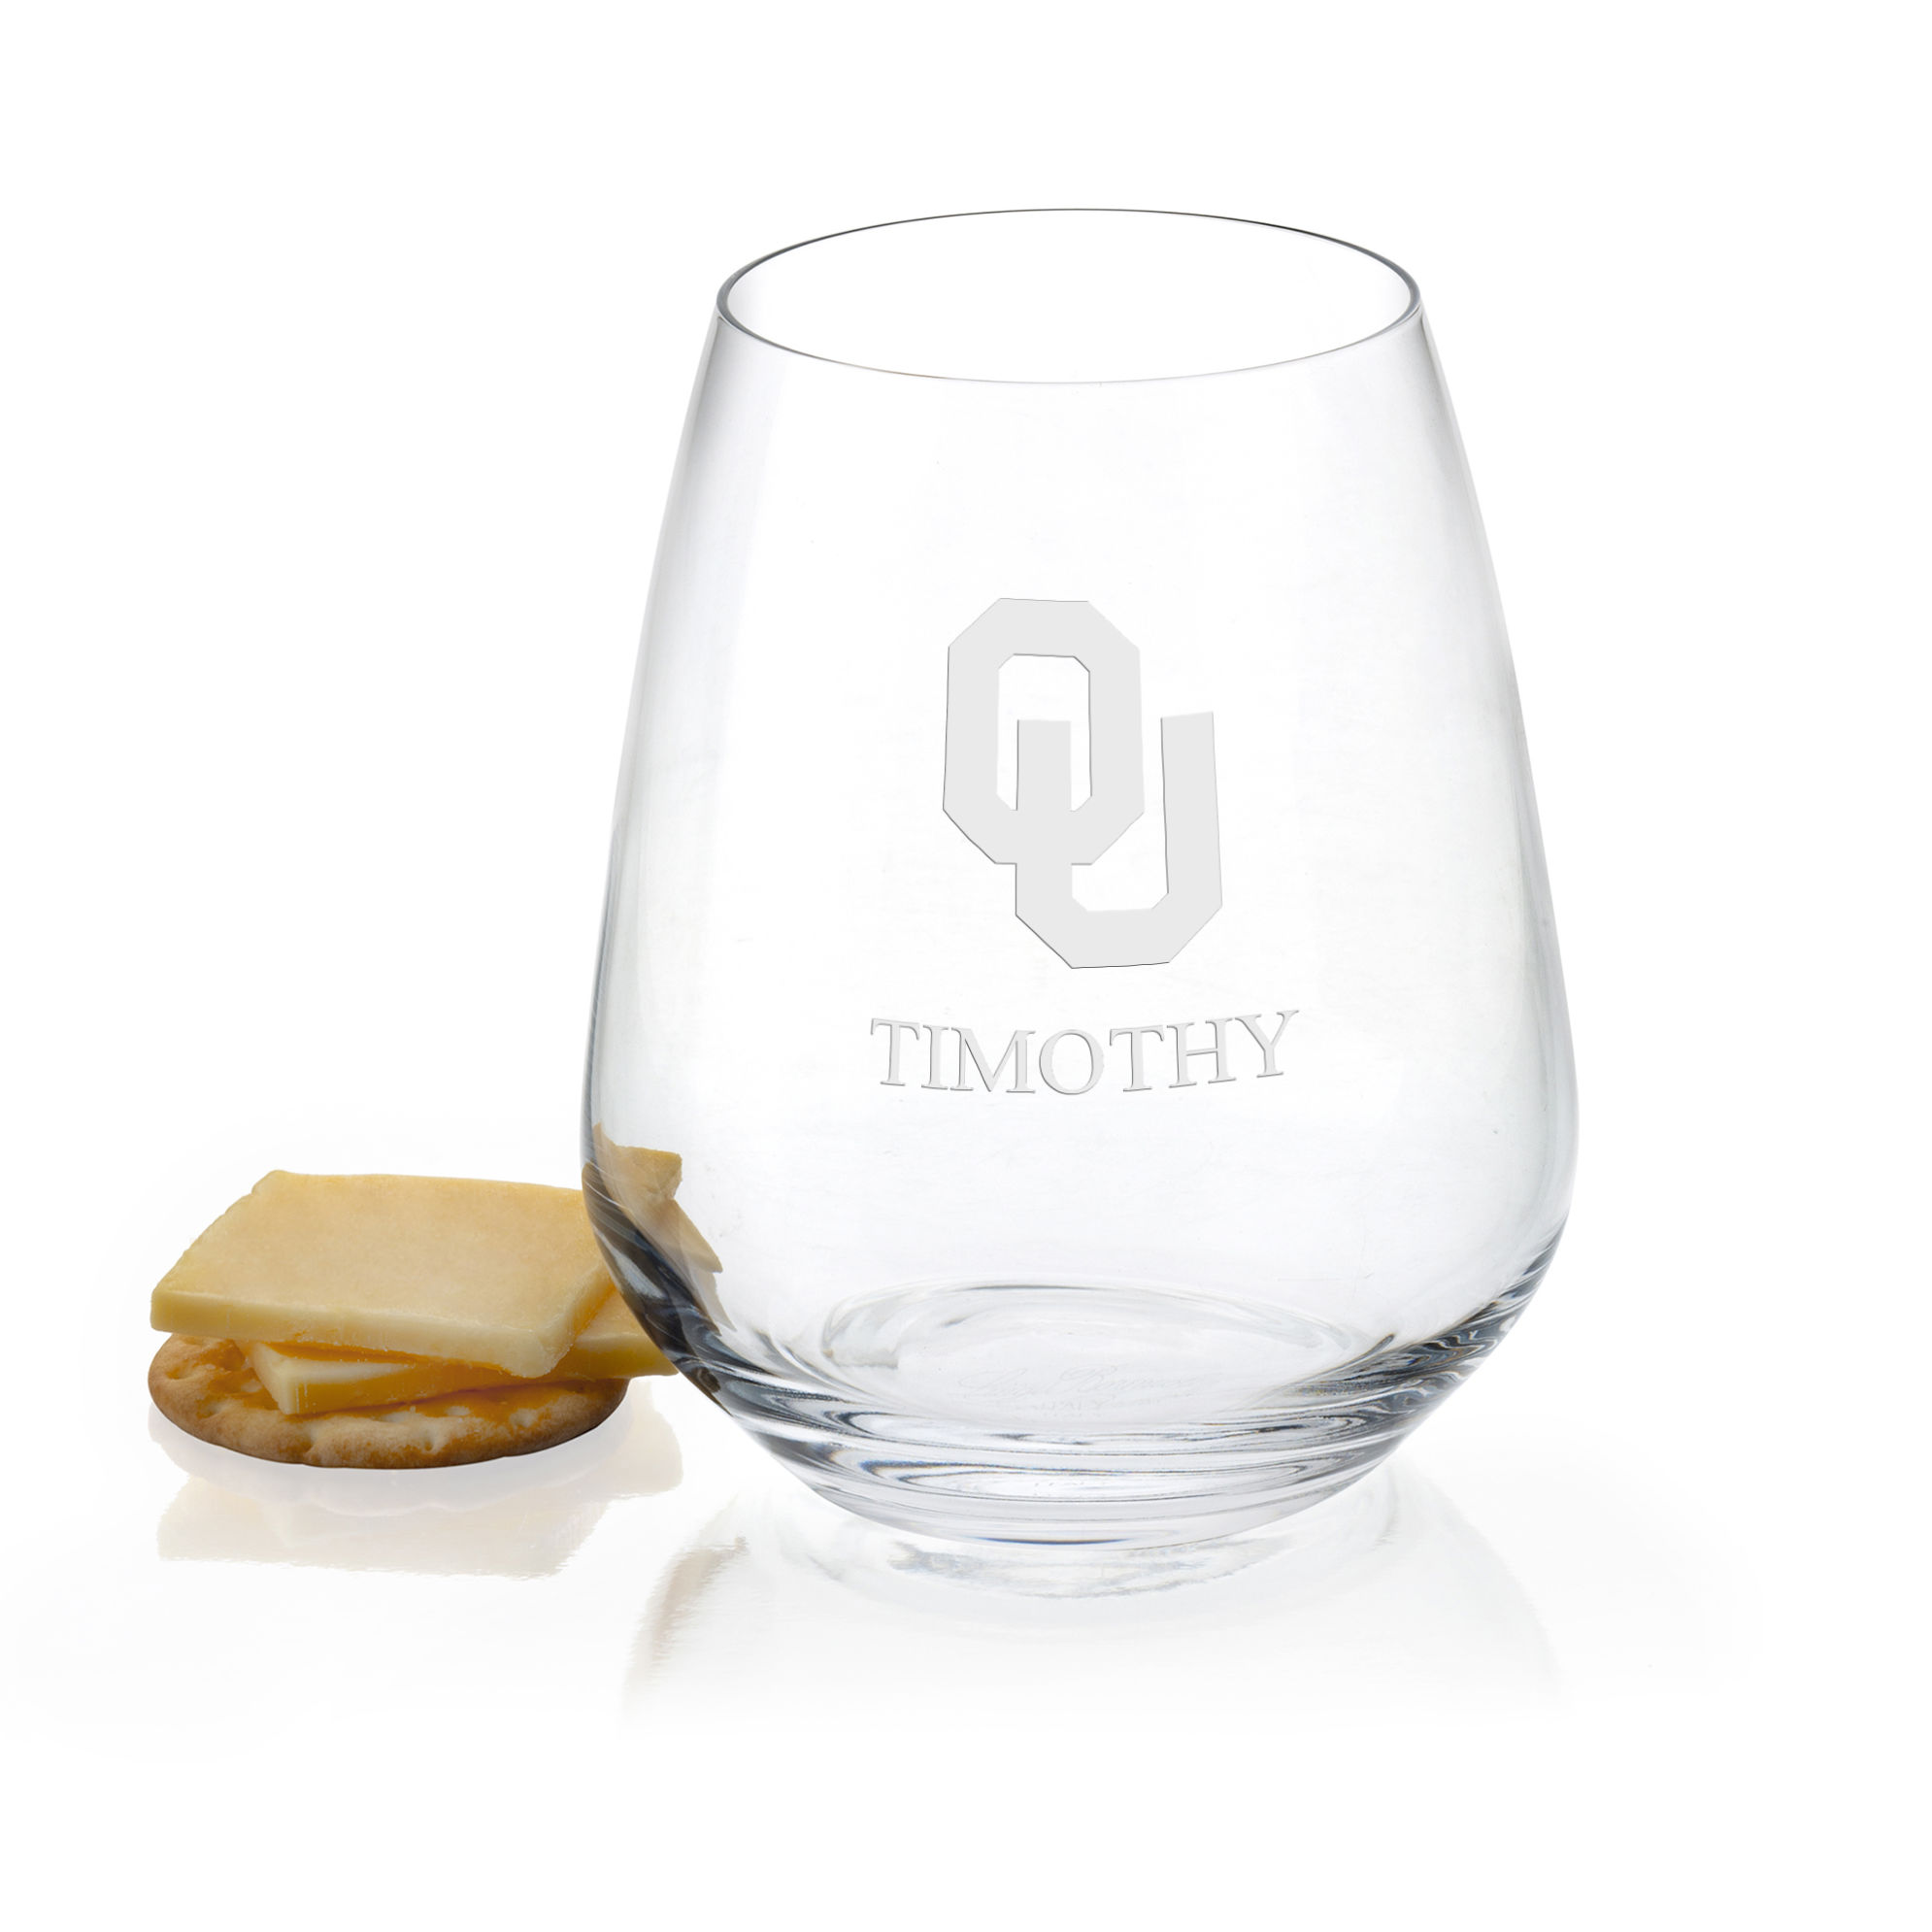 Oklahoma Stemless Wine Glasses - Set of 4